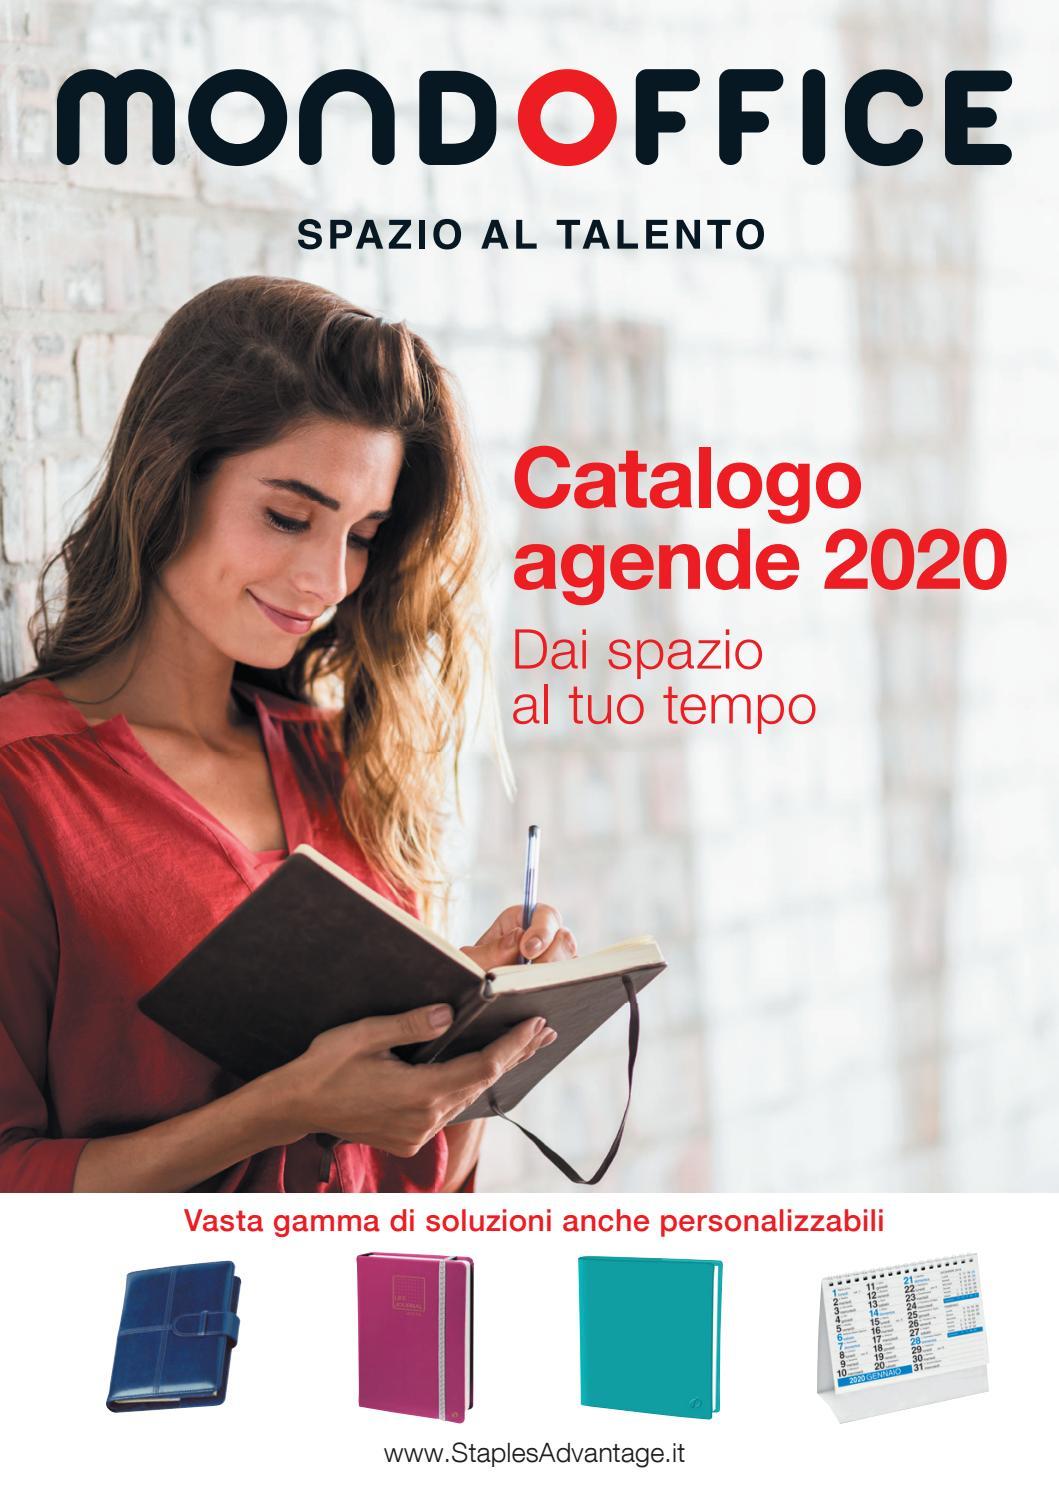 Agenda Giornaliera 2020 Tucson Turchese 15x21 cm